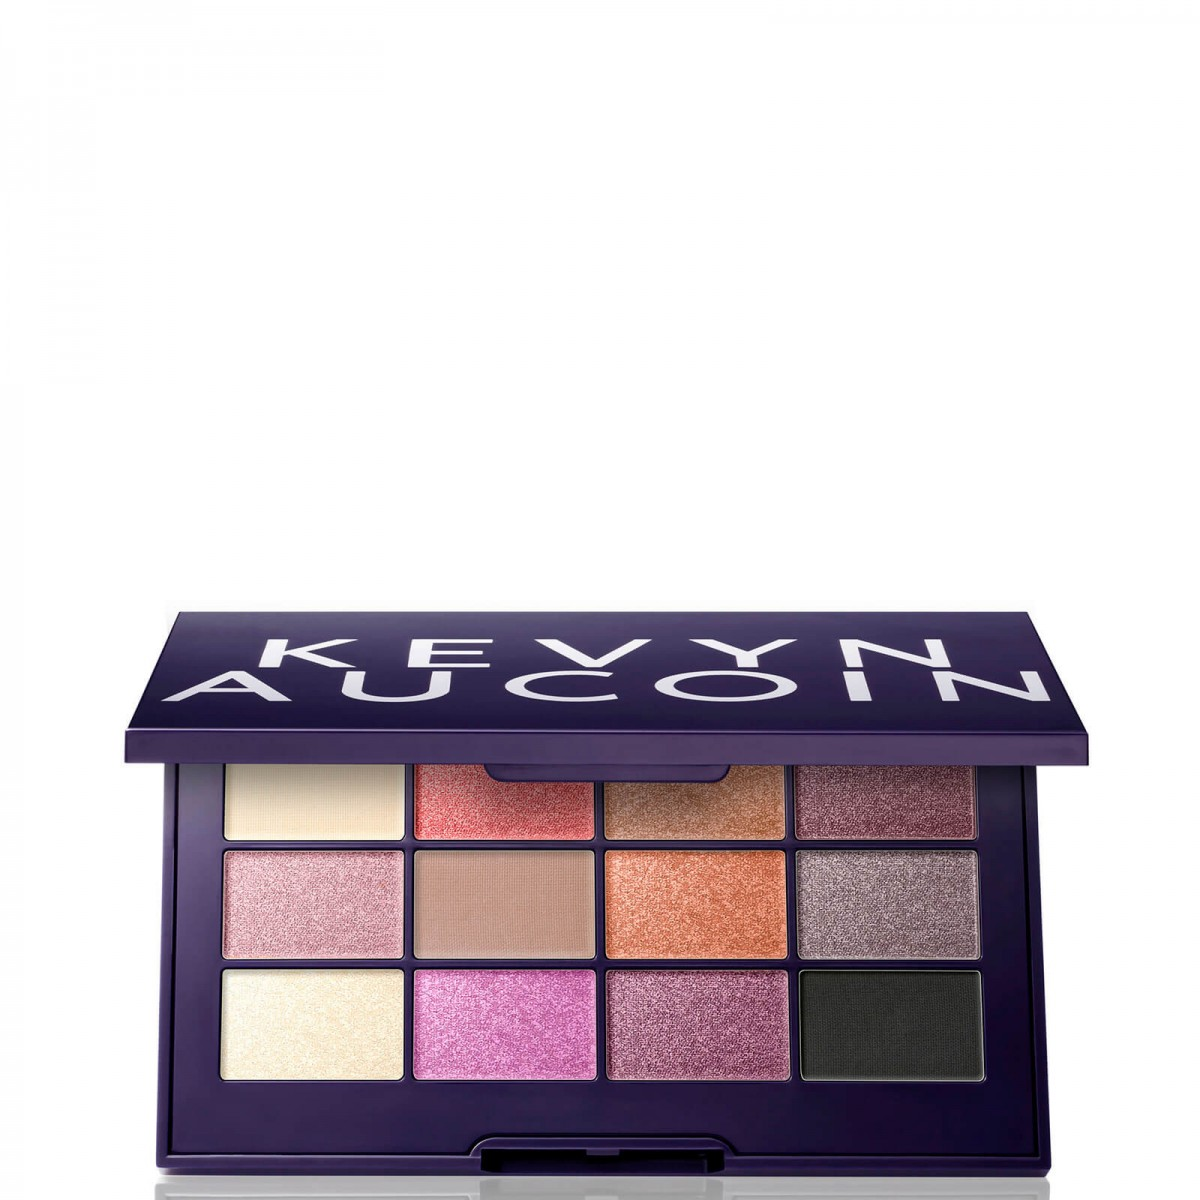 Kevyn Aucoin Beauty Blitz Kid Eyeshadow Palette